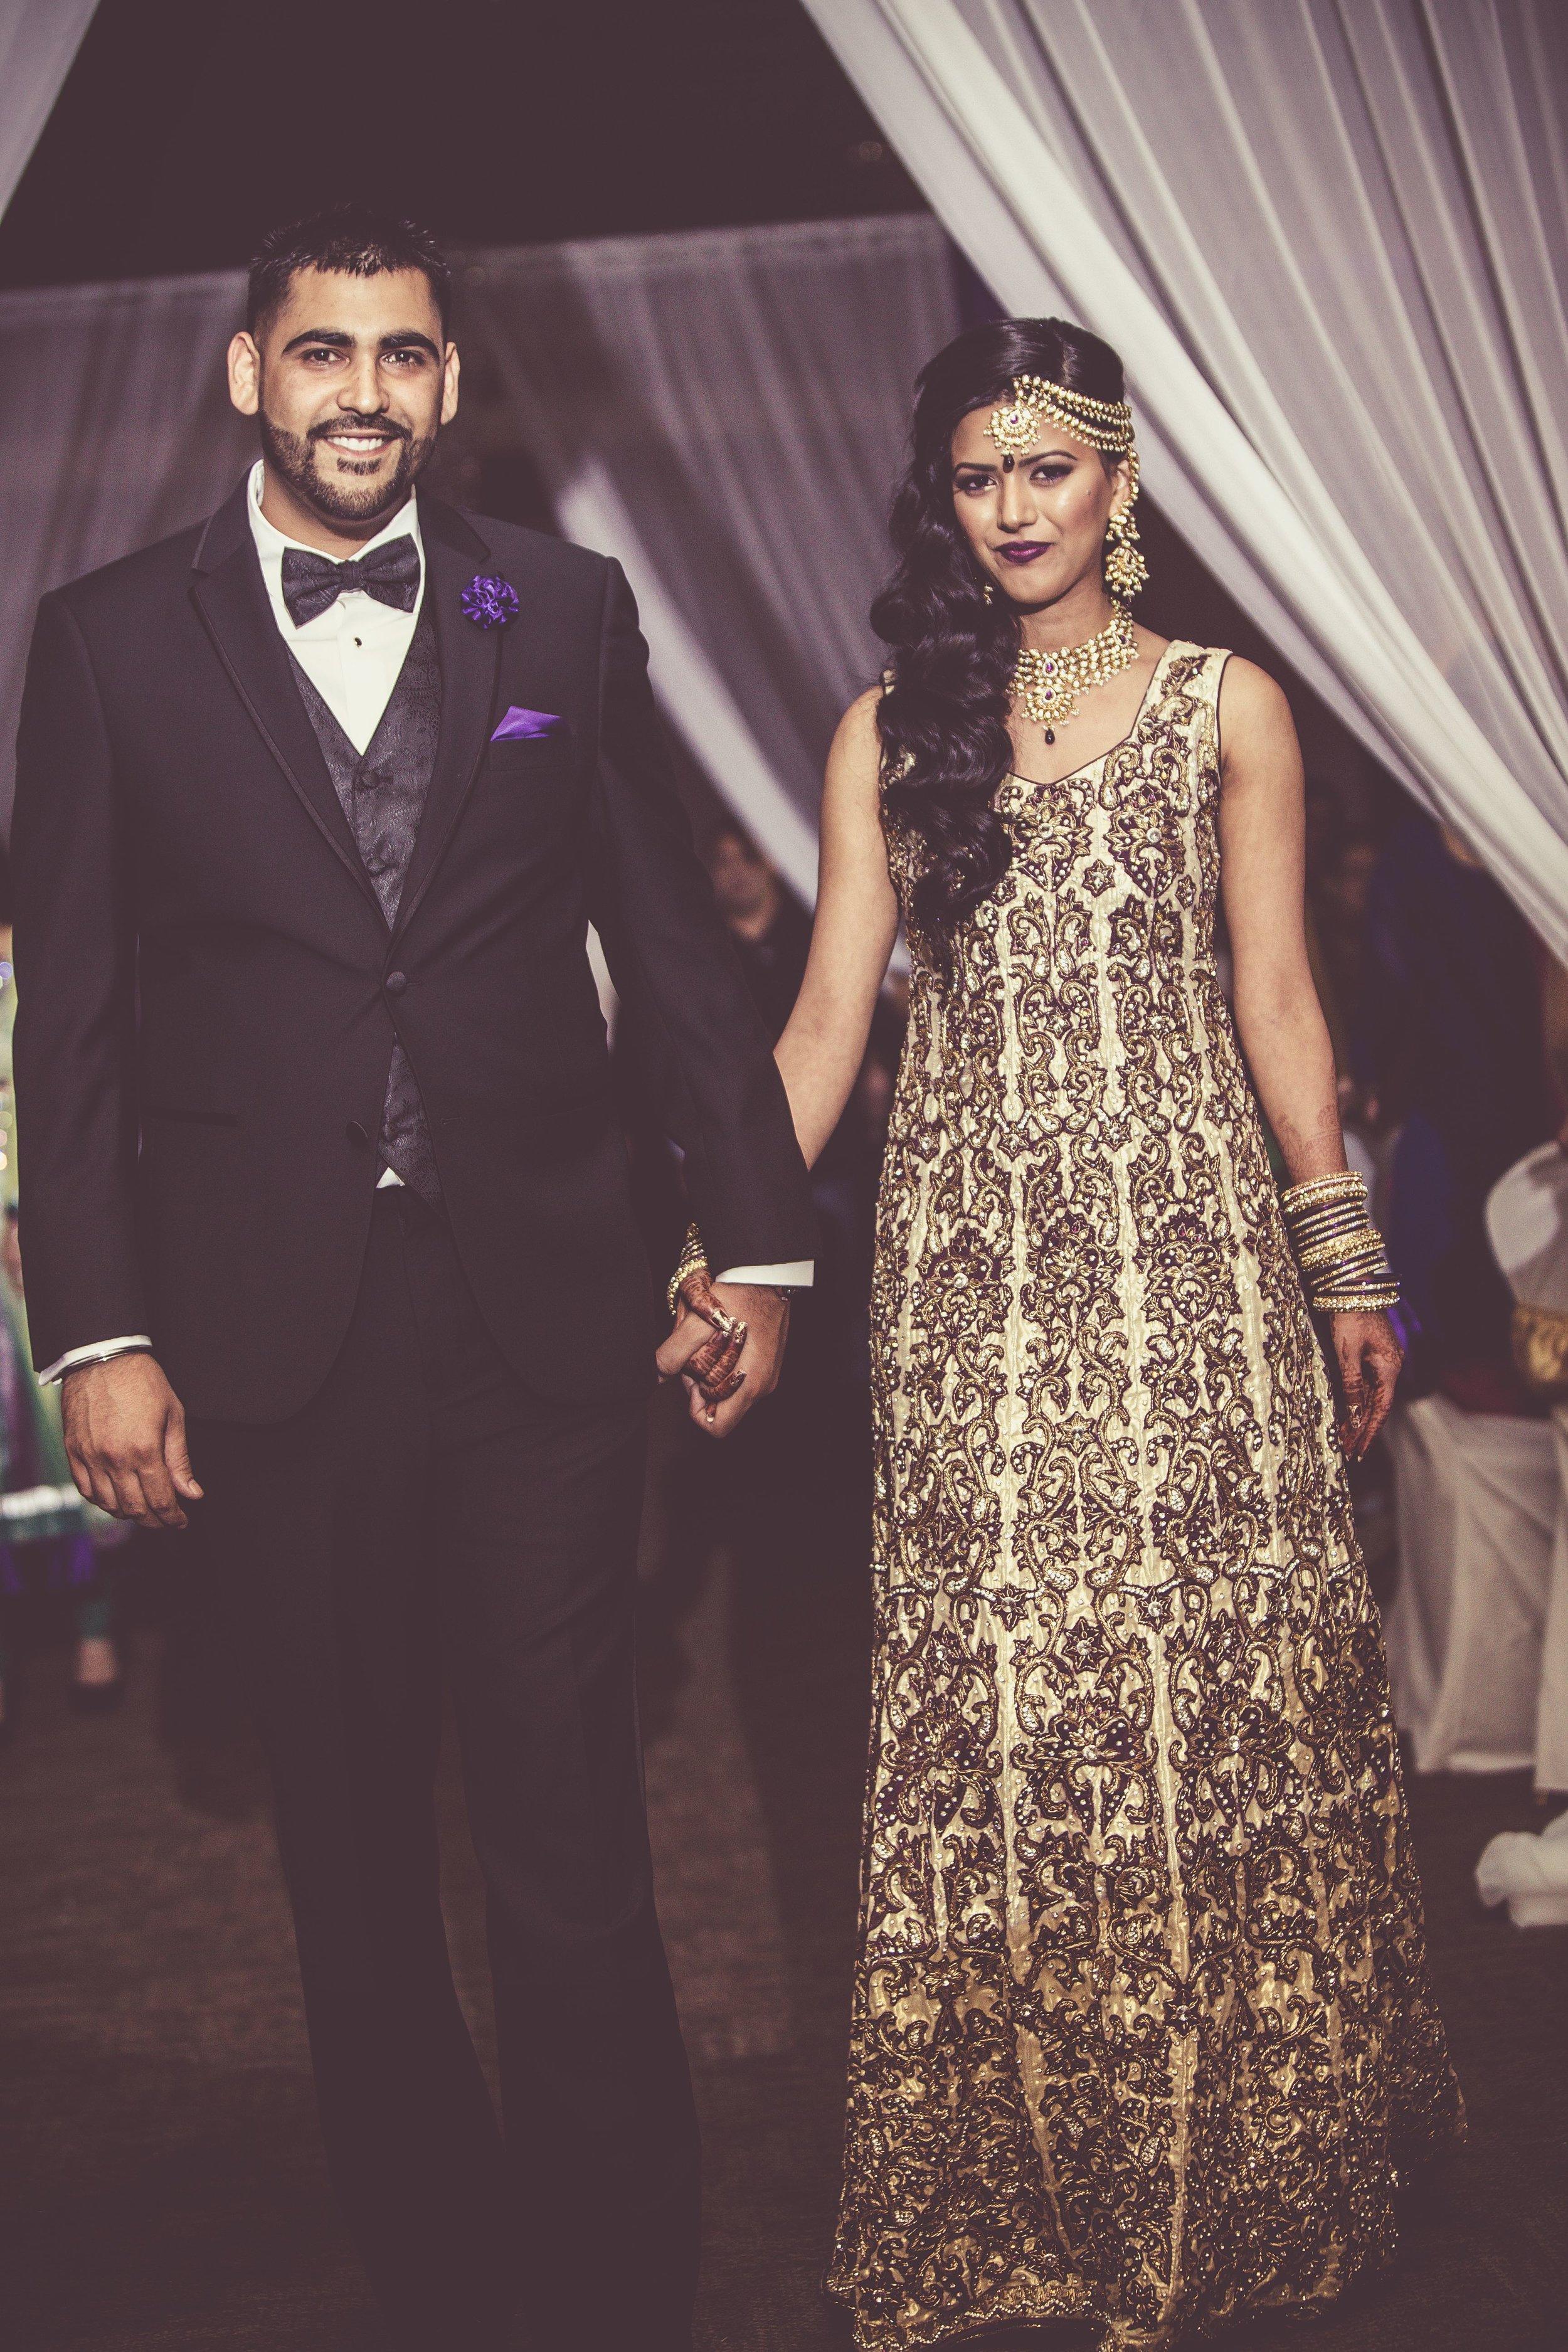 online140 Jatinder & Khushbir Reception24.jpg